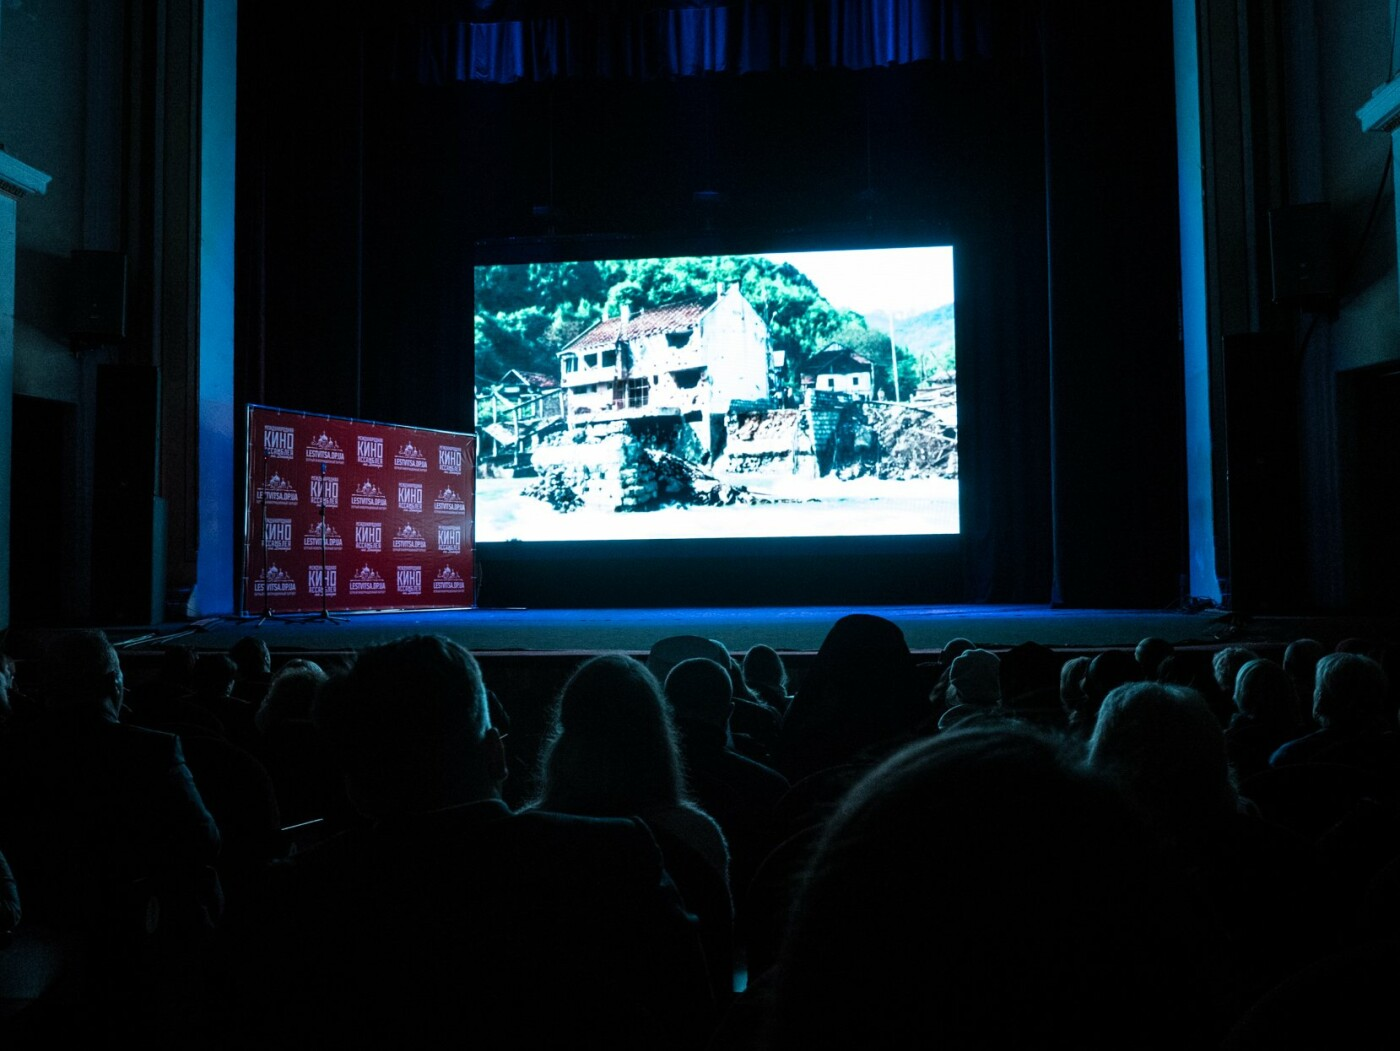 Киноассамблея на Днепре-2018: как прошла церемония открытия кинофорума (ФОТО), фото-3